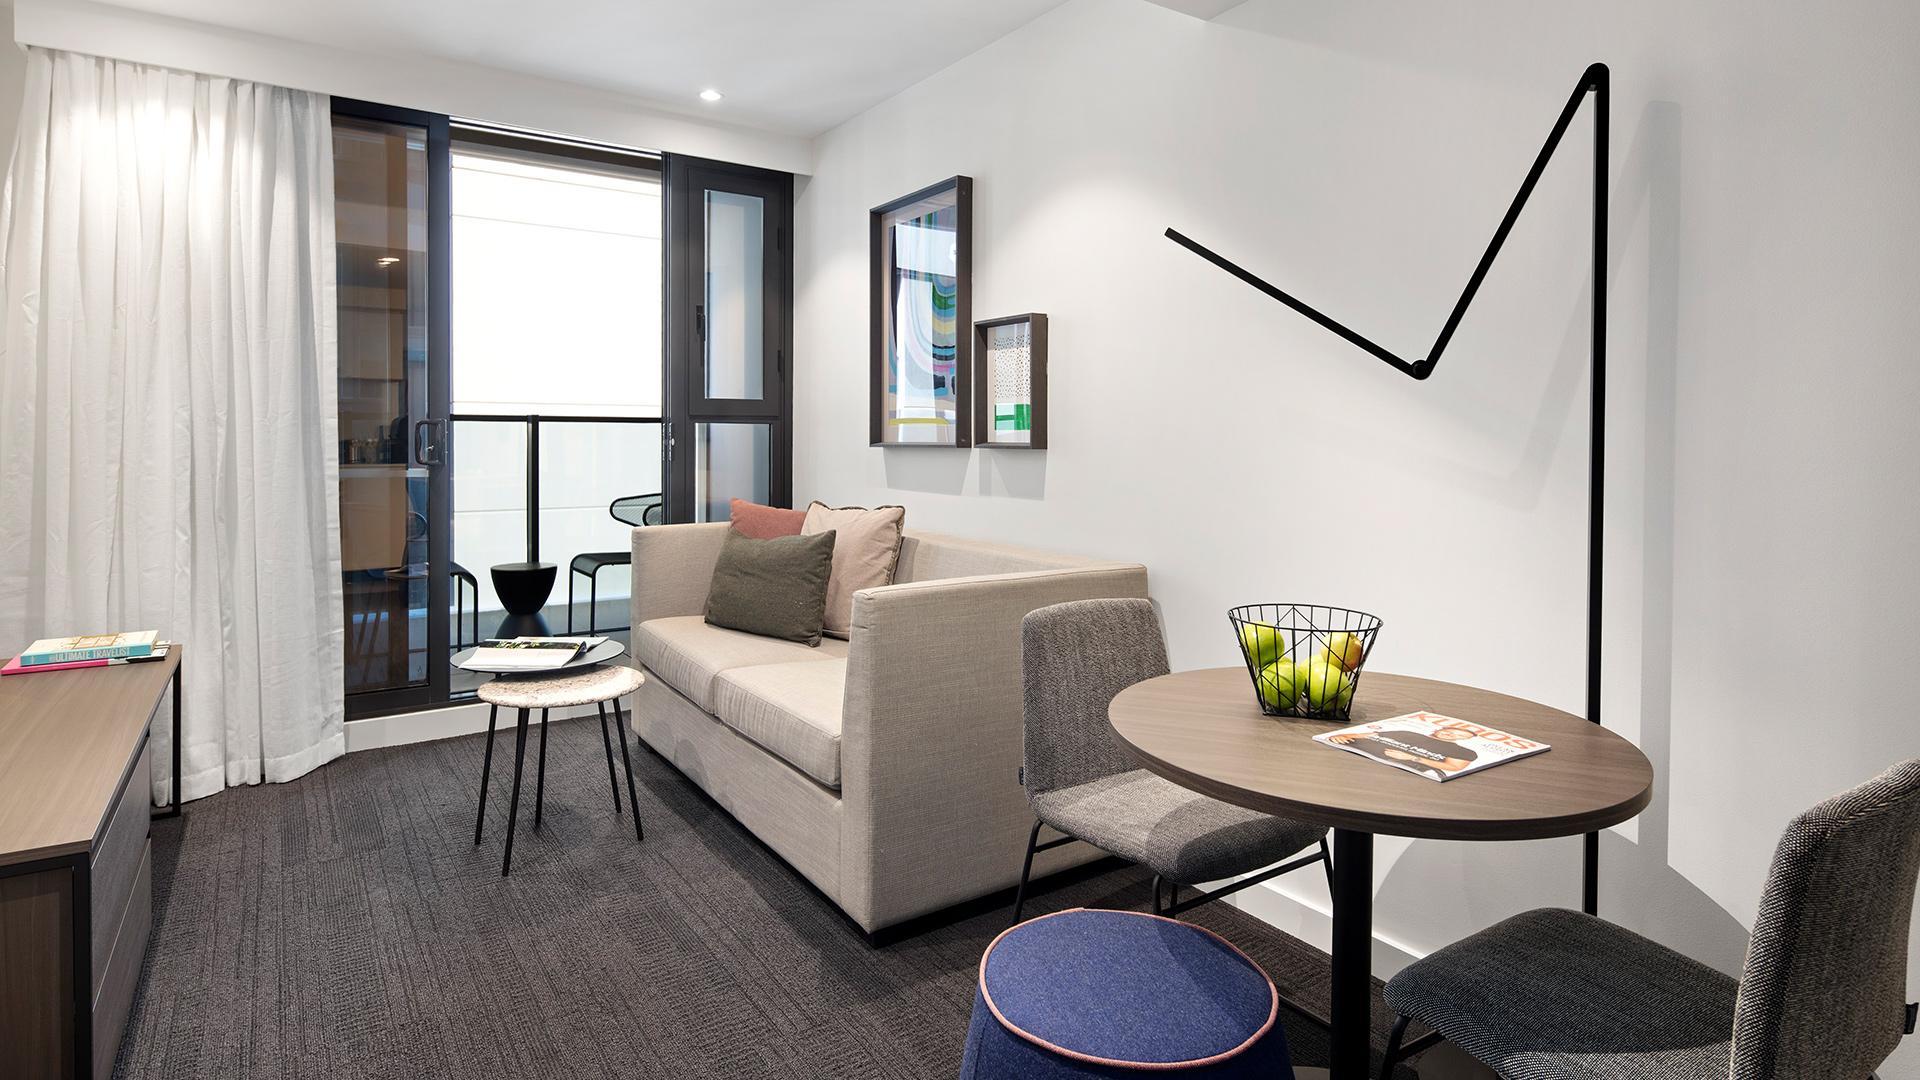 One-Bedroom Apartment image 1 at Quest St Kilda Road by Port Phillip City, Victoria, Australia